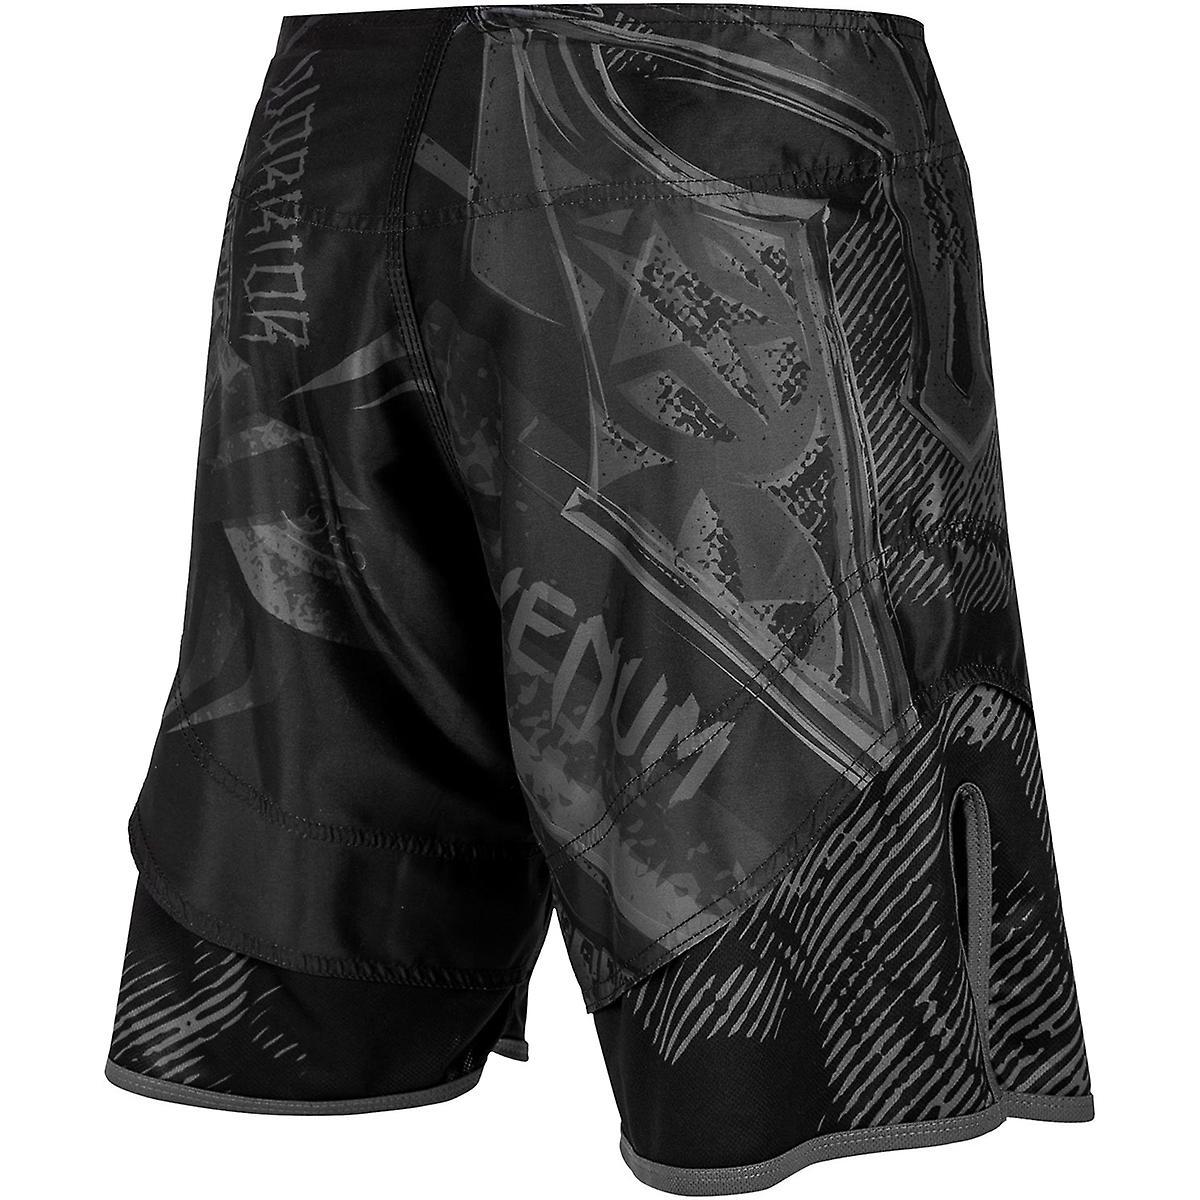 Pantaloncini Venum gladiatore 3.0 MMA lotta - Black/Black